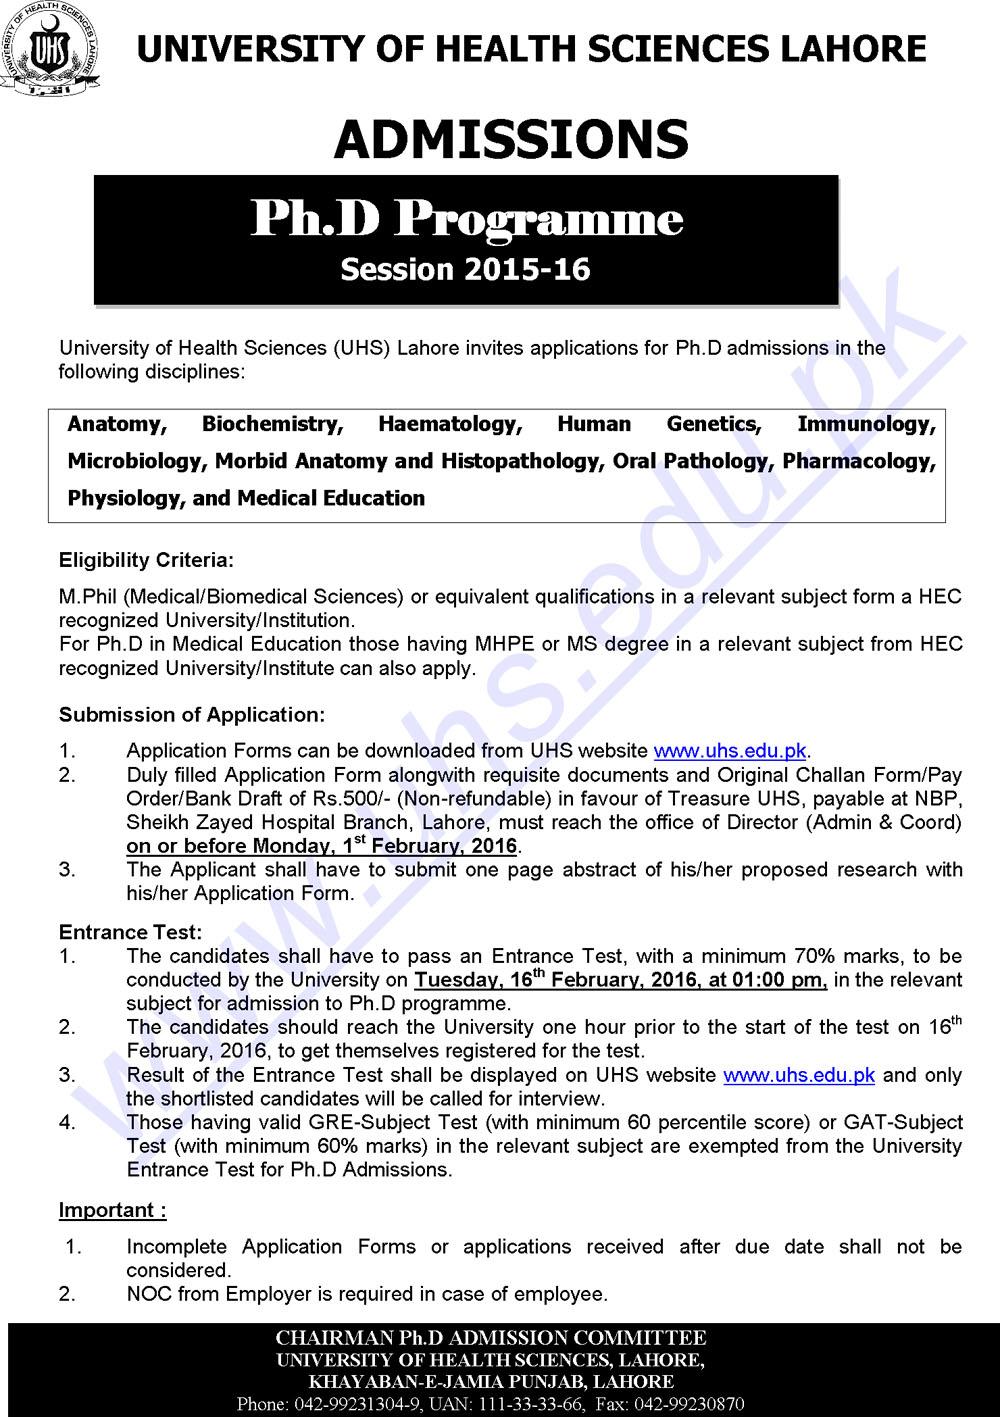 University Of Health Sciences Lahore PHD programs